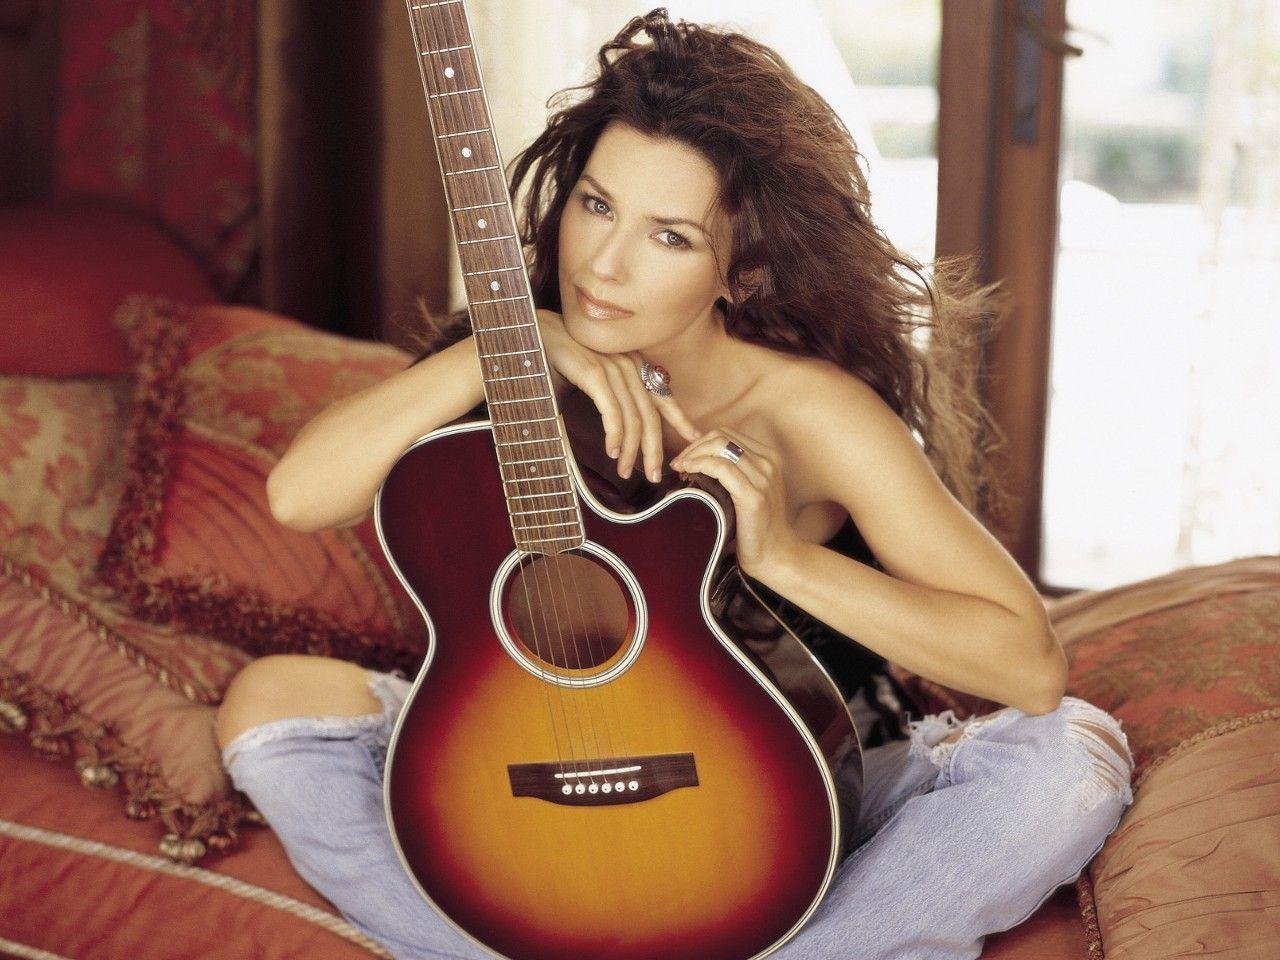 http://1.bp.blogspot.com/_5rFMRm_YIq8/TTd5hq2xrOI/AAAAAAAABHc/kz9Gd__5aWI/s1600/Shania_Twain.jpg